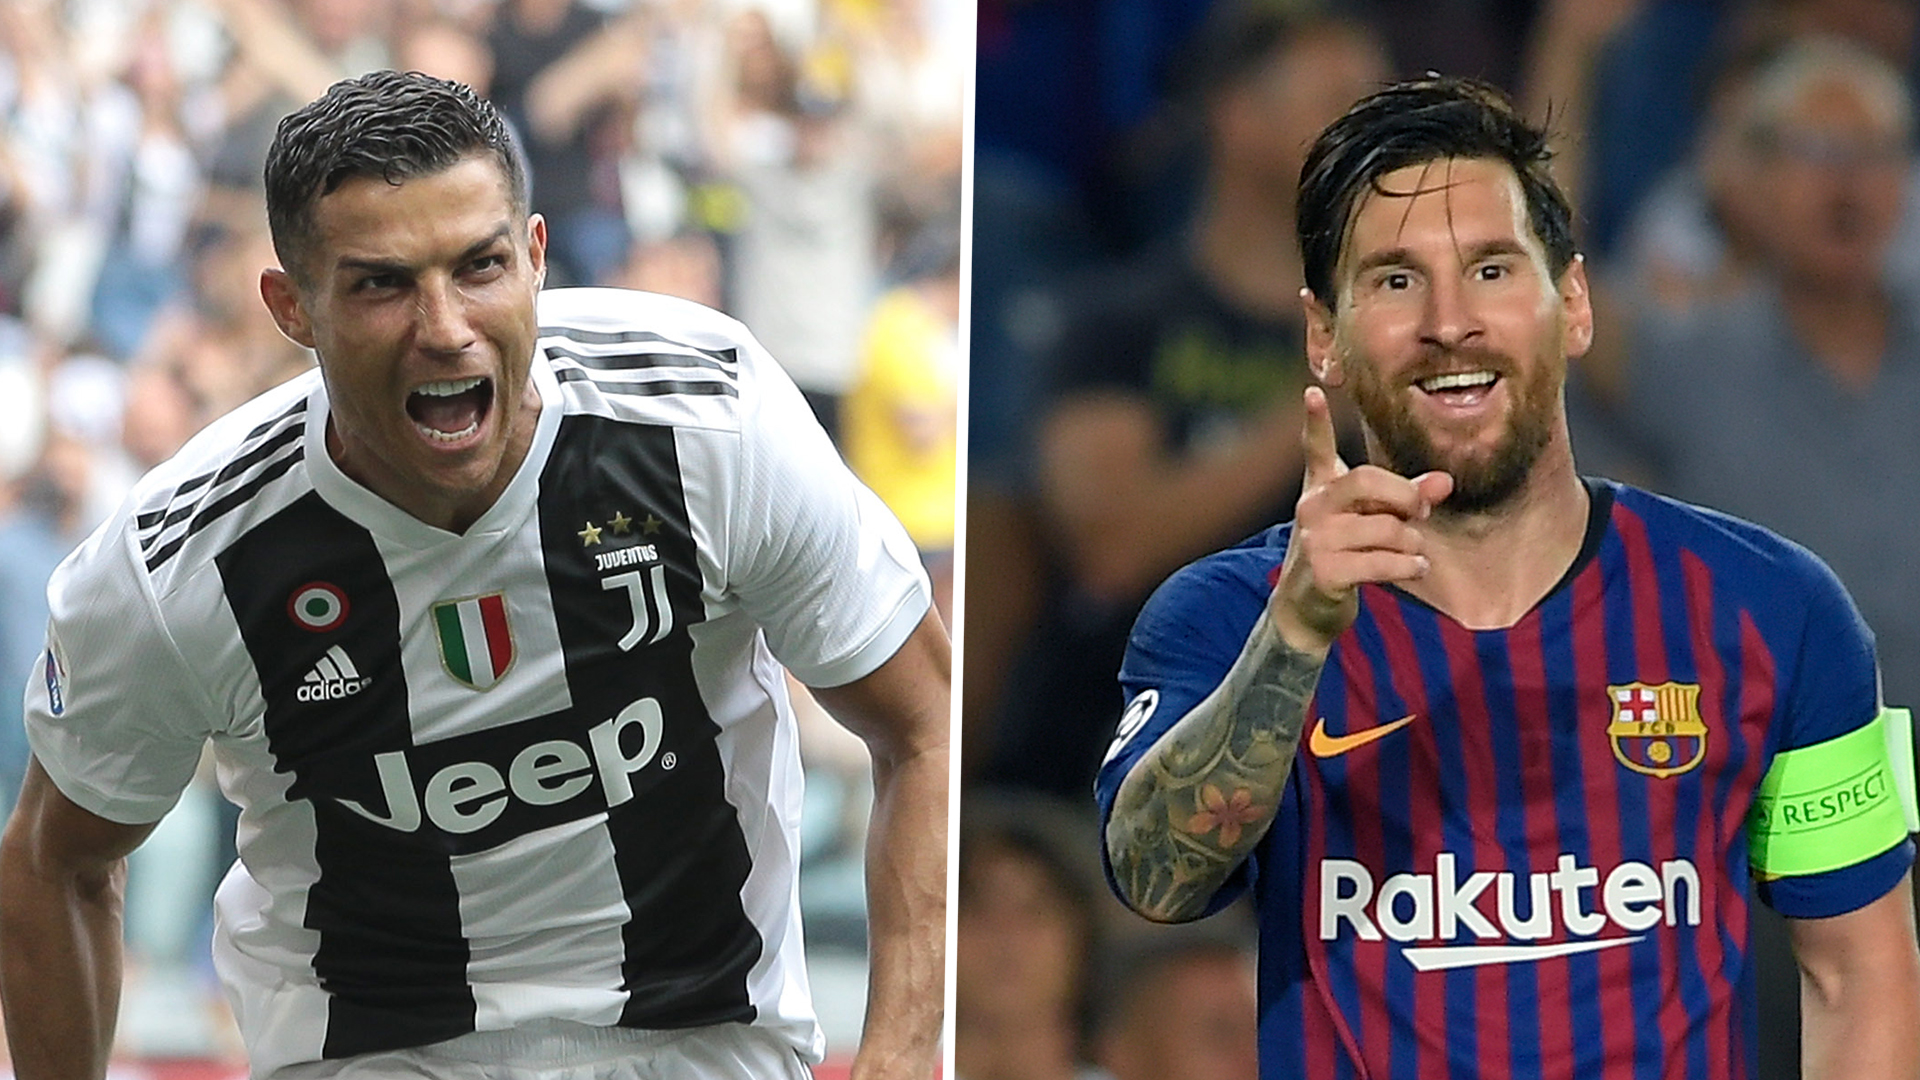 Champions League all-time top scorers - Ronaldo, Messi UCL goal kings